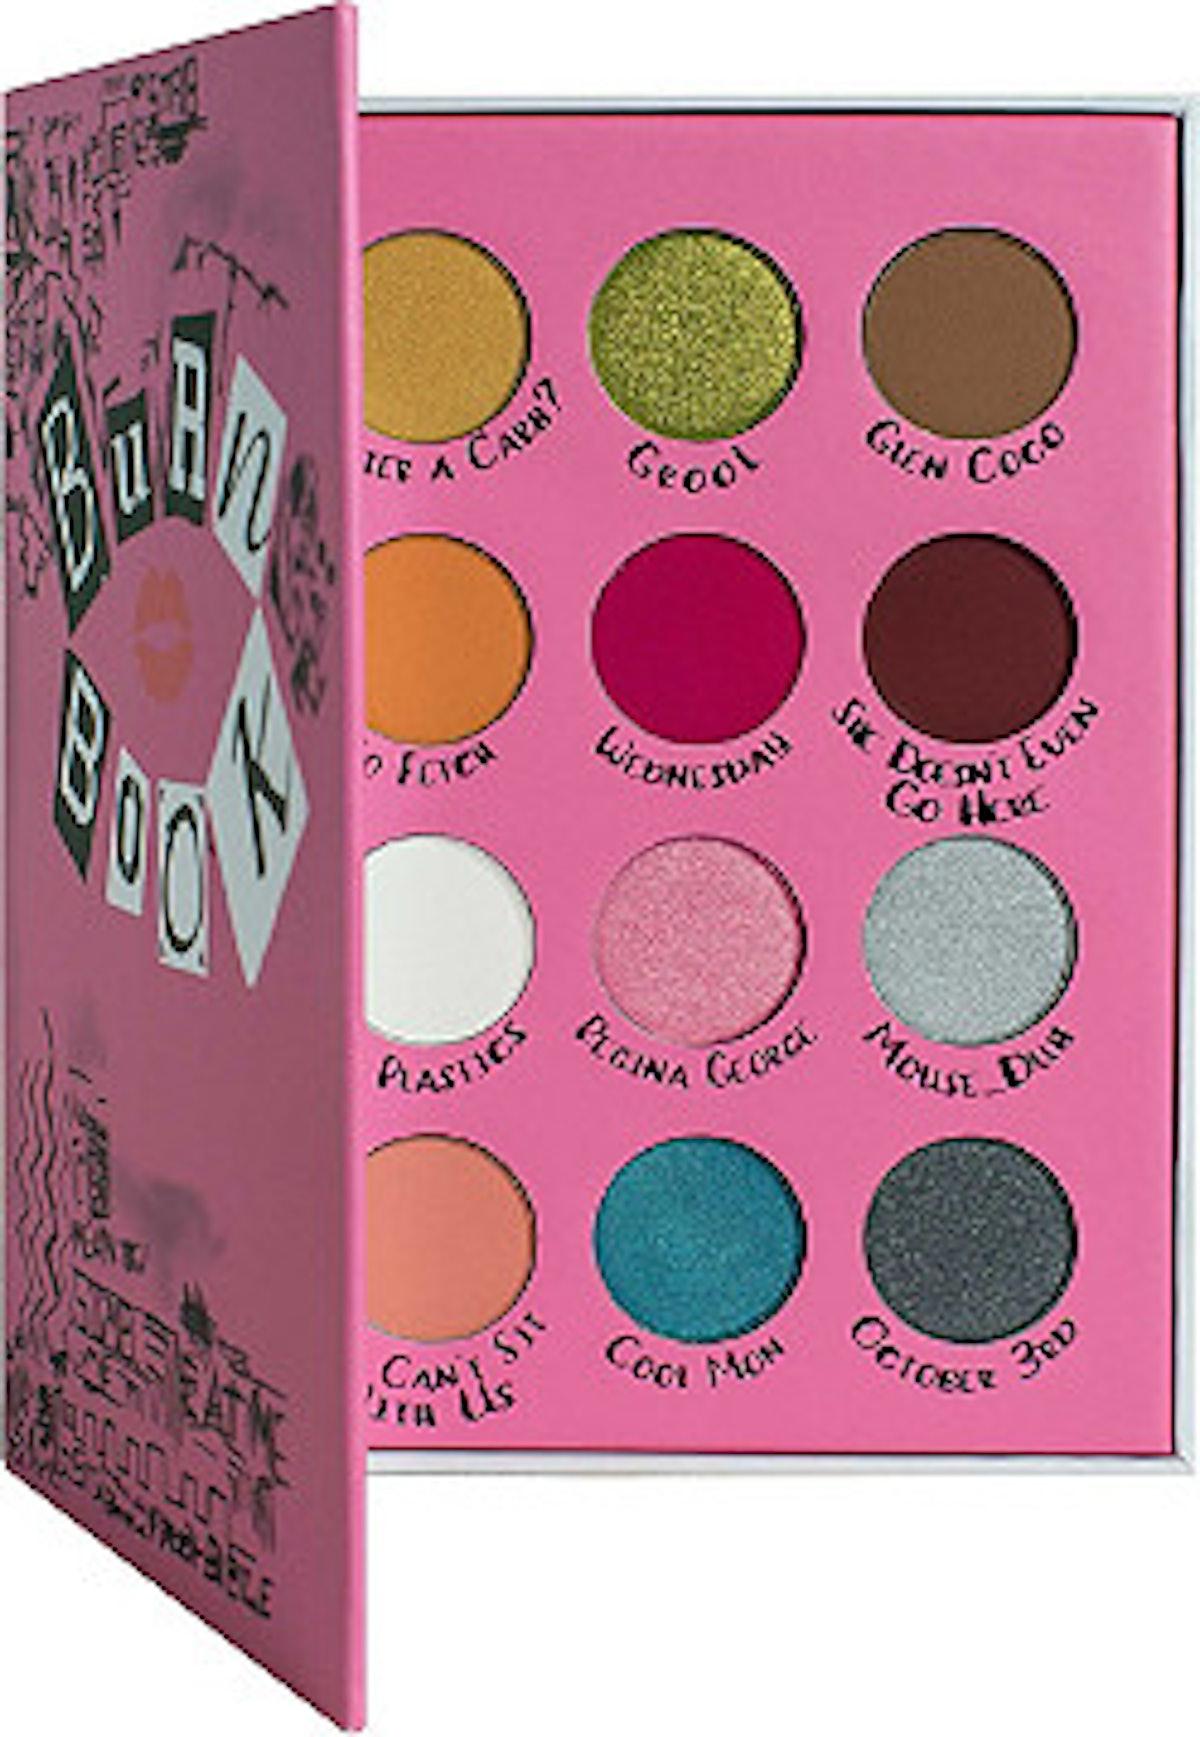 STORYBOOK COSMETICS Storybook Cosmetics x Mean Girls Burn Book Storybook Palette